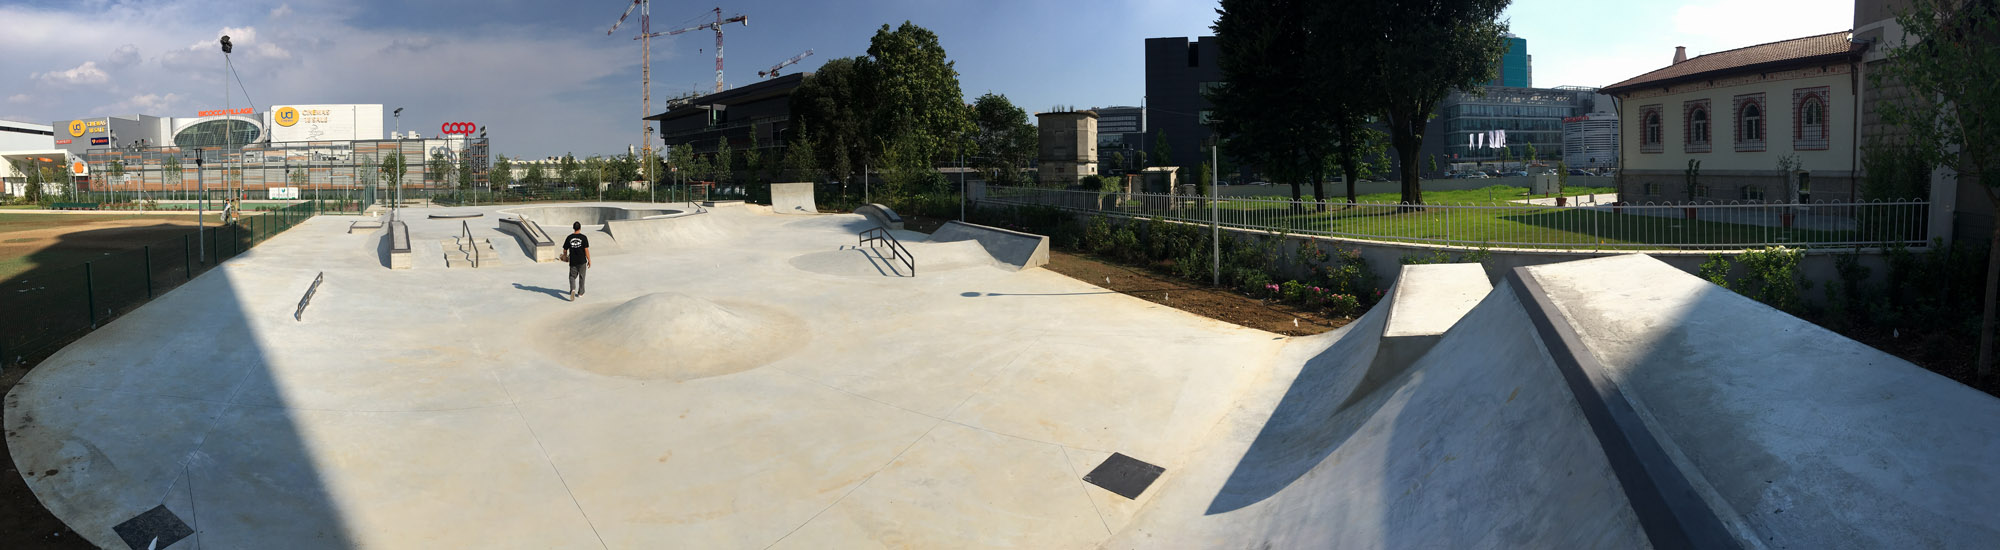 bicocca-skatepark-1